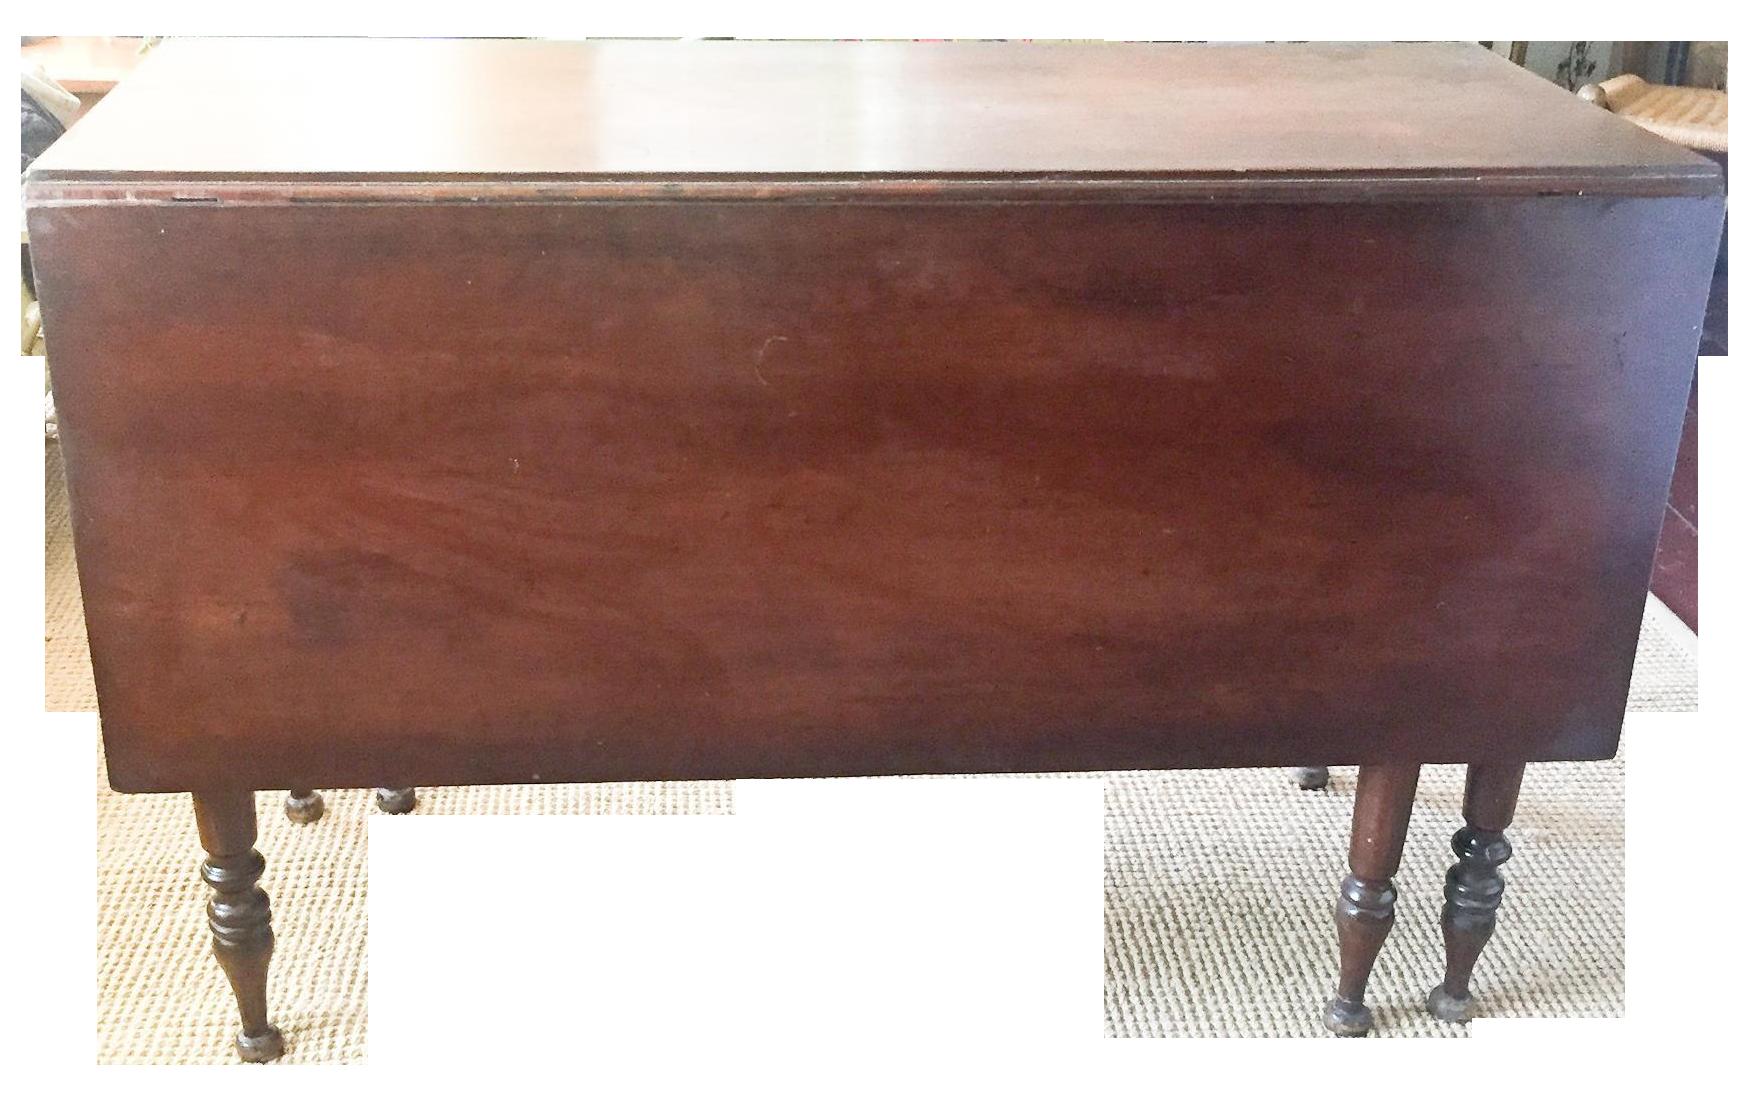 Antique Gate Leg Dining Table Chairish : 3baad8aa 6efa 4724 8b85 ebf19d8b77a5aspectfitampwidth640ampheight640 from www.chairish.com size 640 x 640 jpeg 27kB